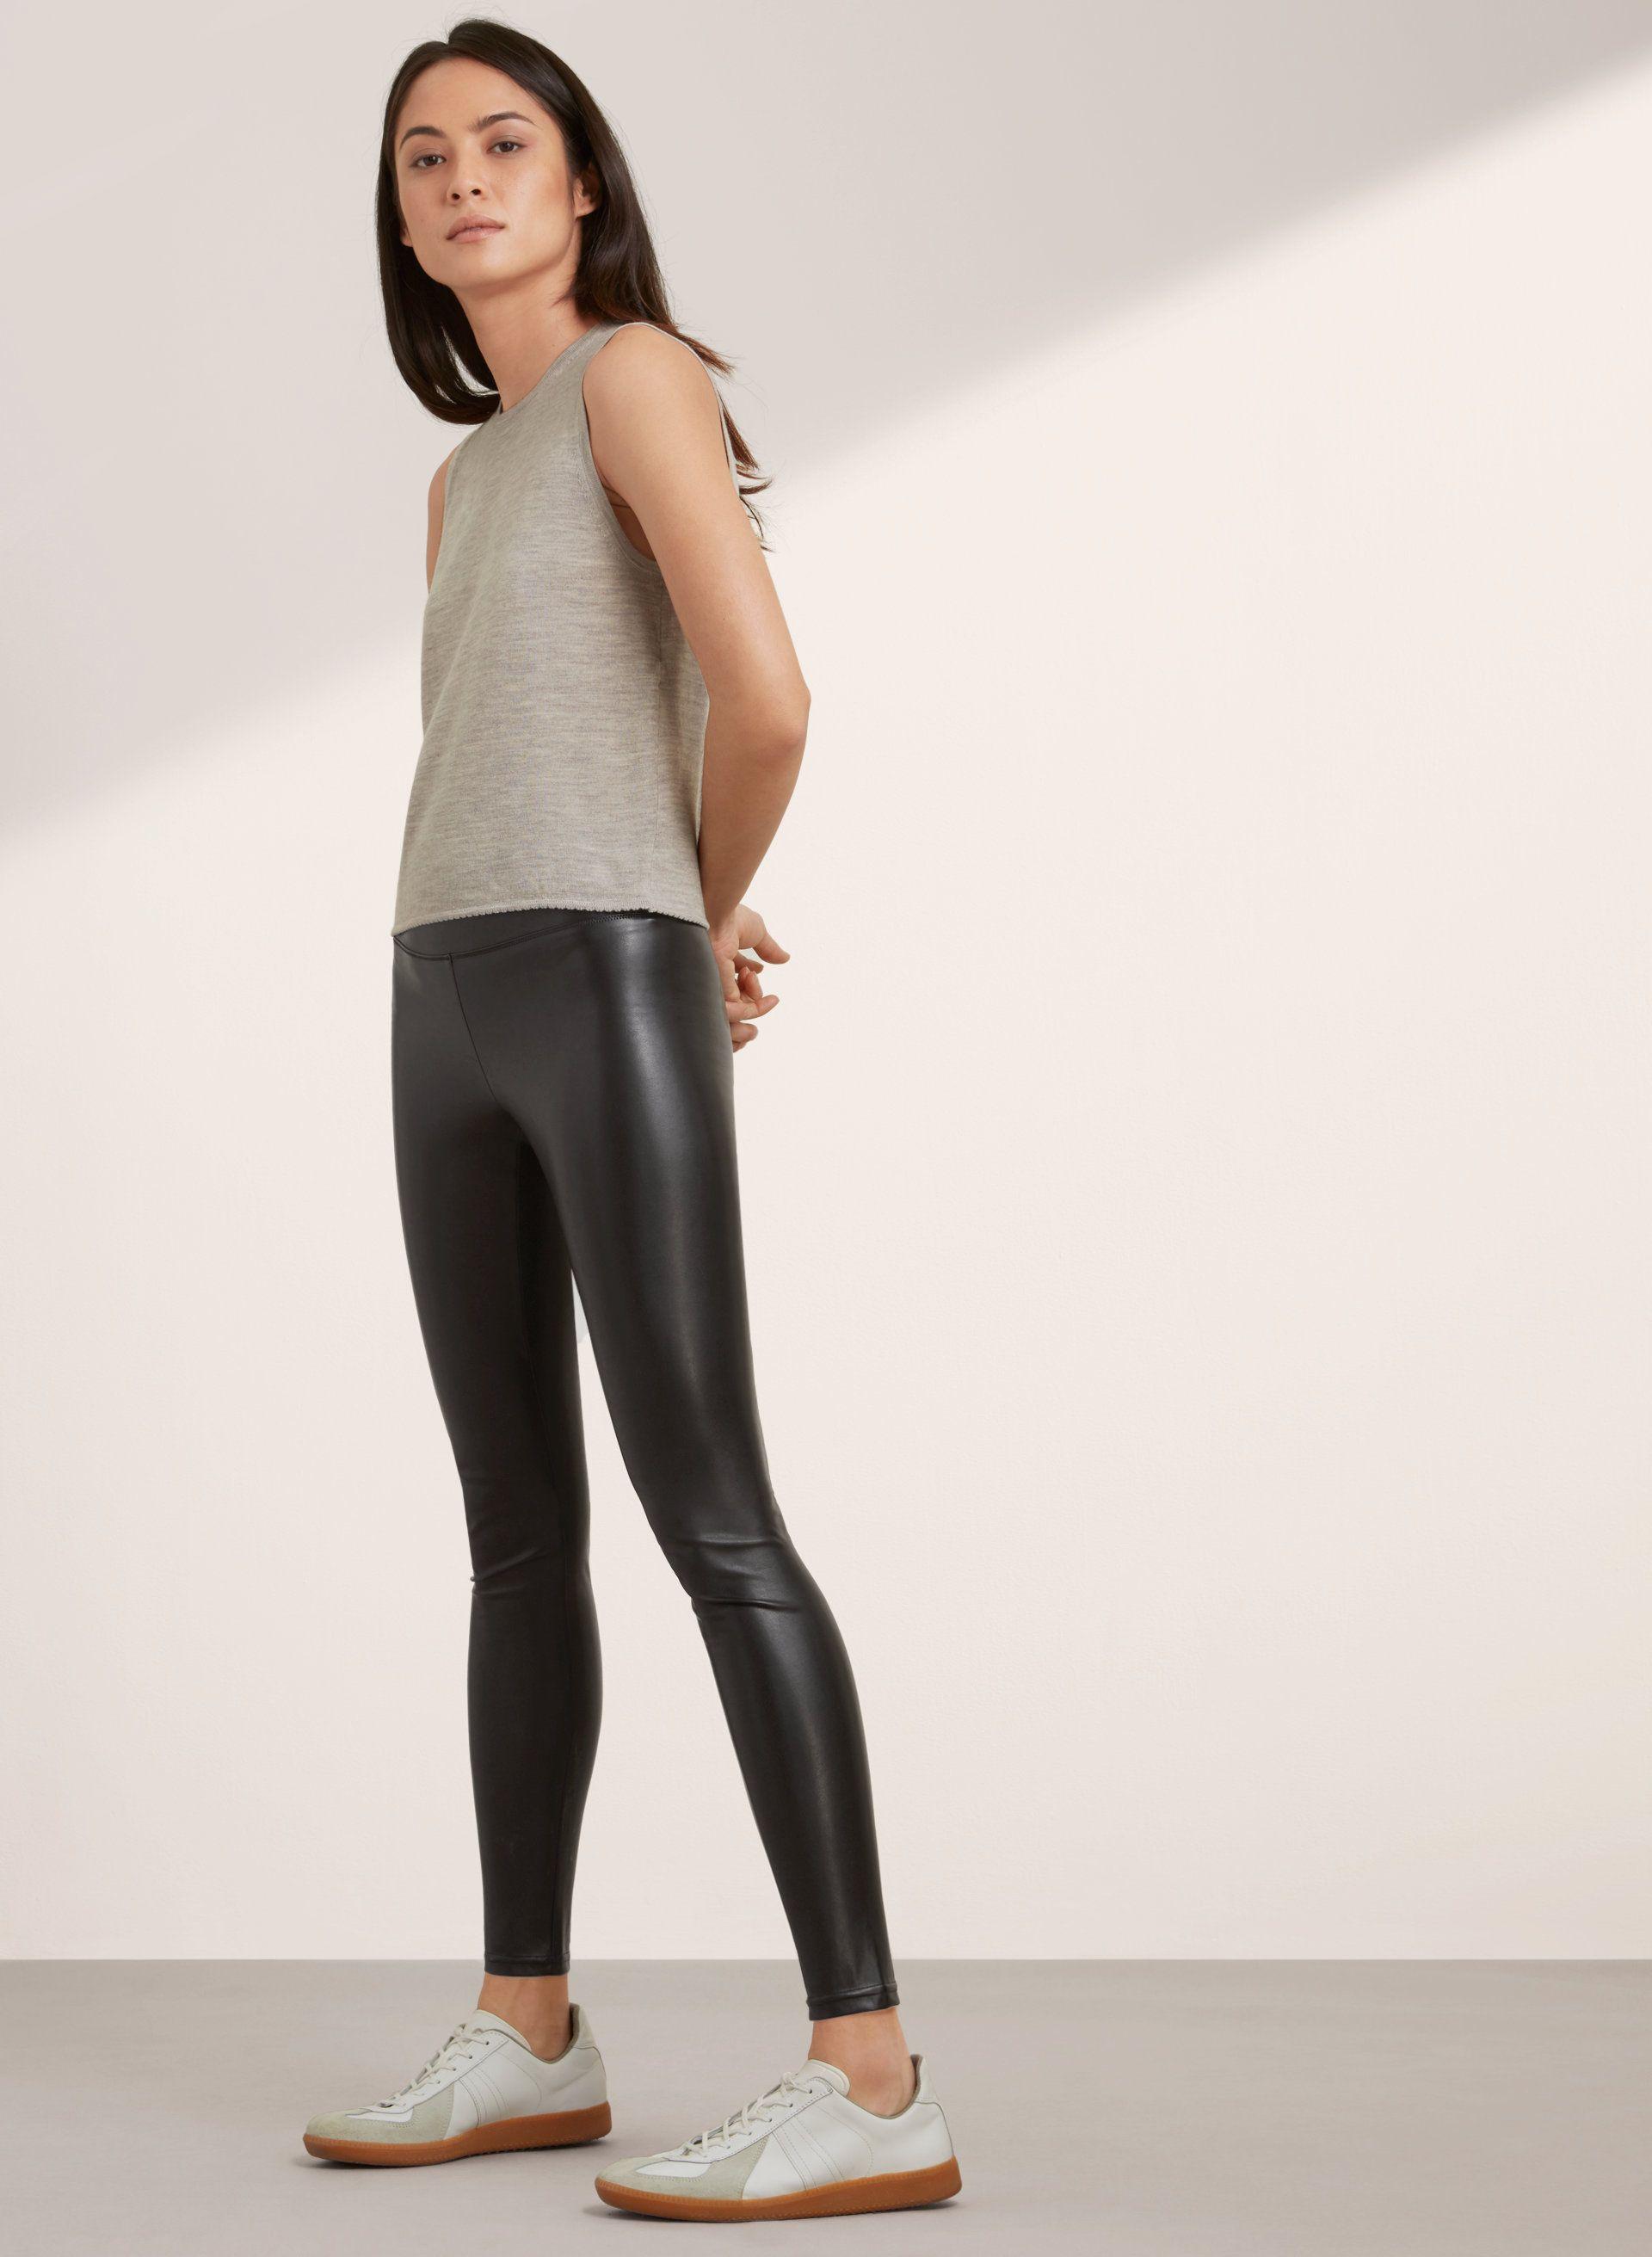 626311f75a0e0 Wilfred Free MID-RISE DARIA PANT | Aritzia | ASAP | Pants, Leather ...